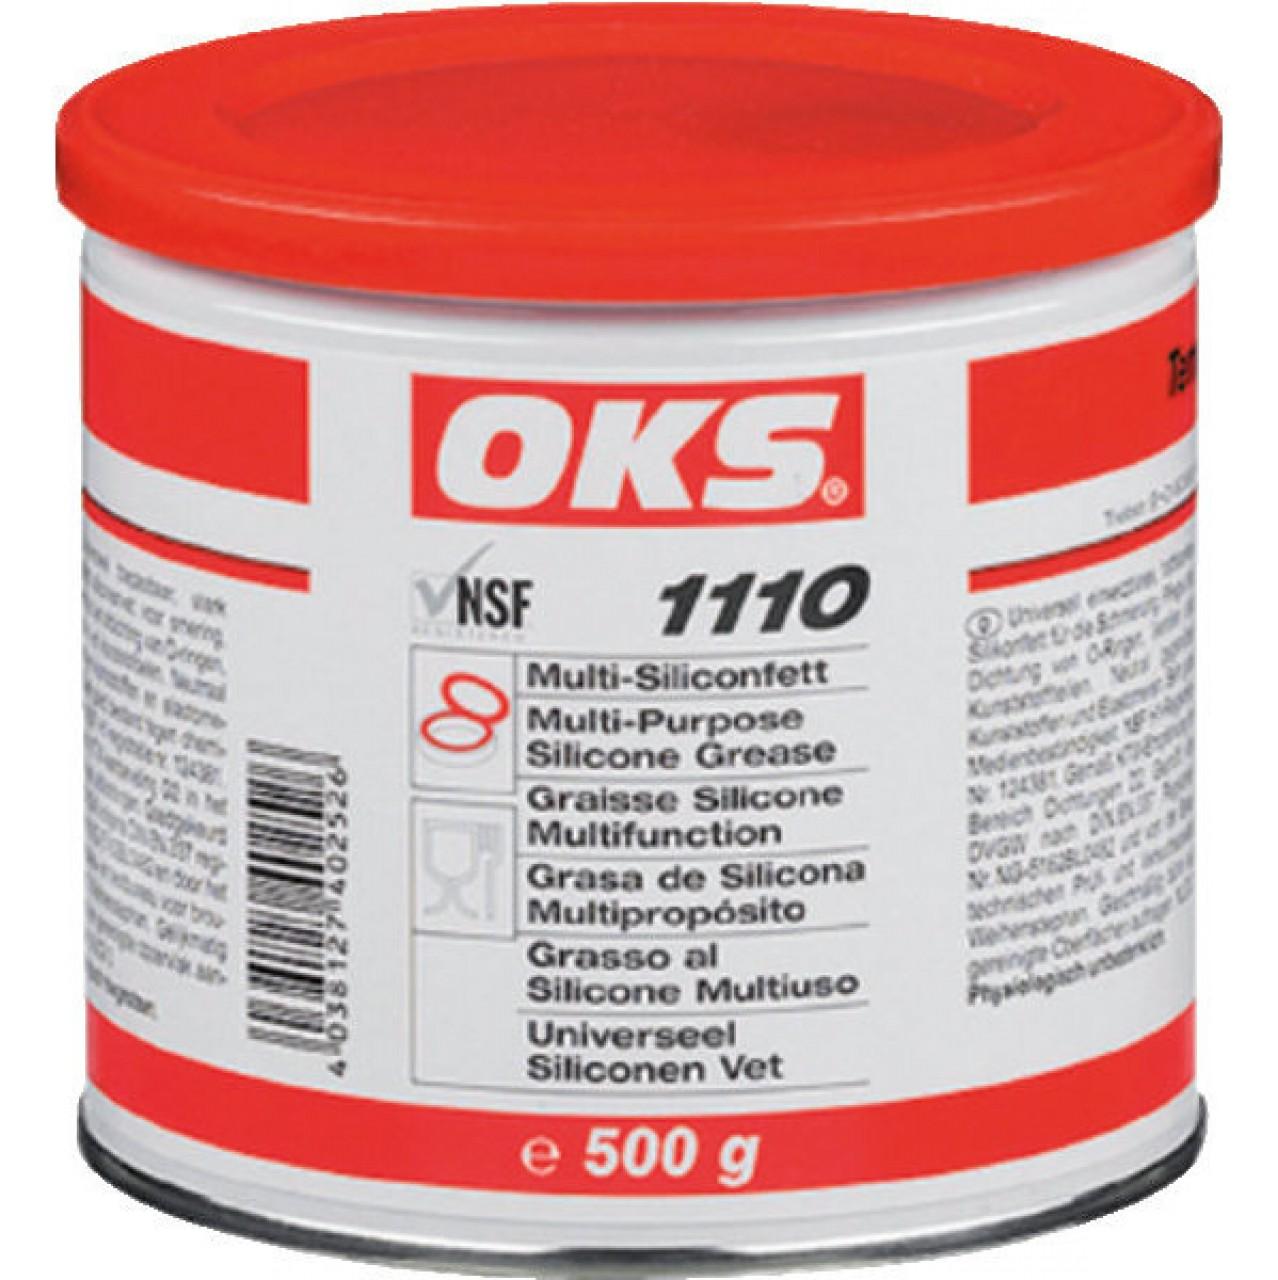 Silikonfett OKS 1110 500g Dose für die Lebensmitteltechnik